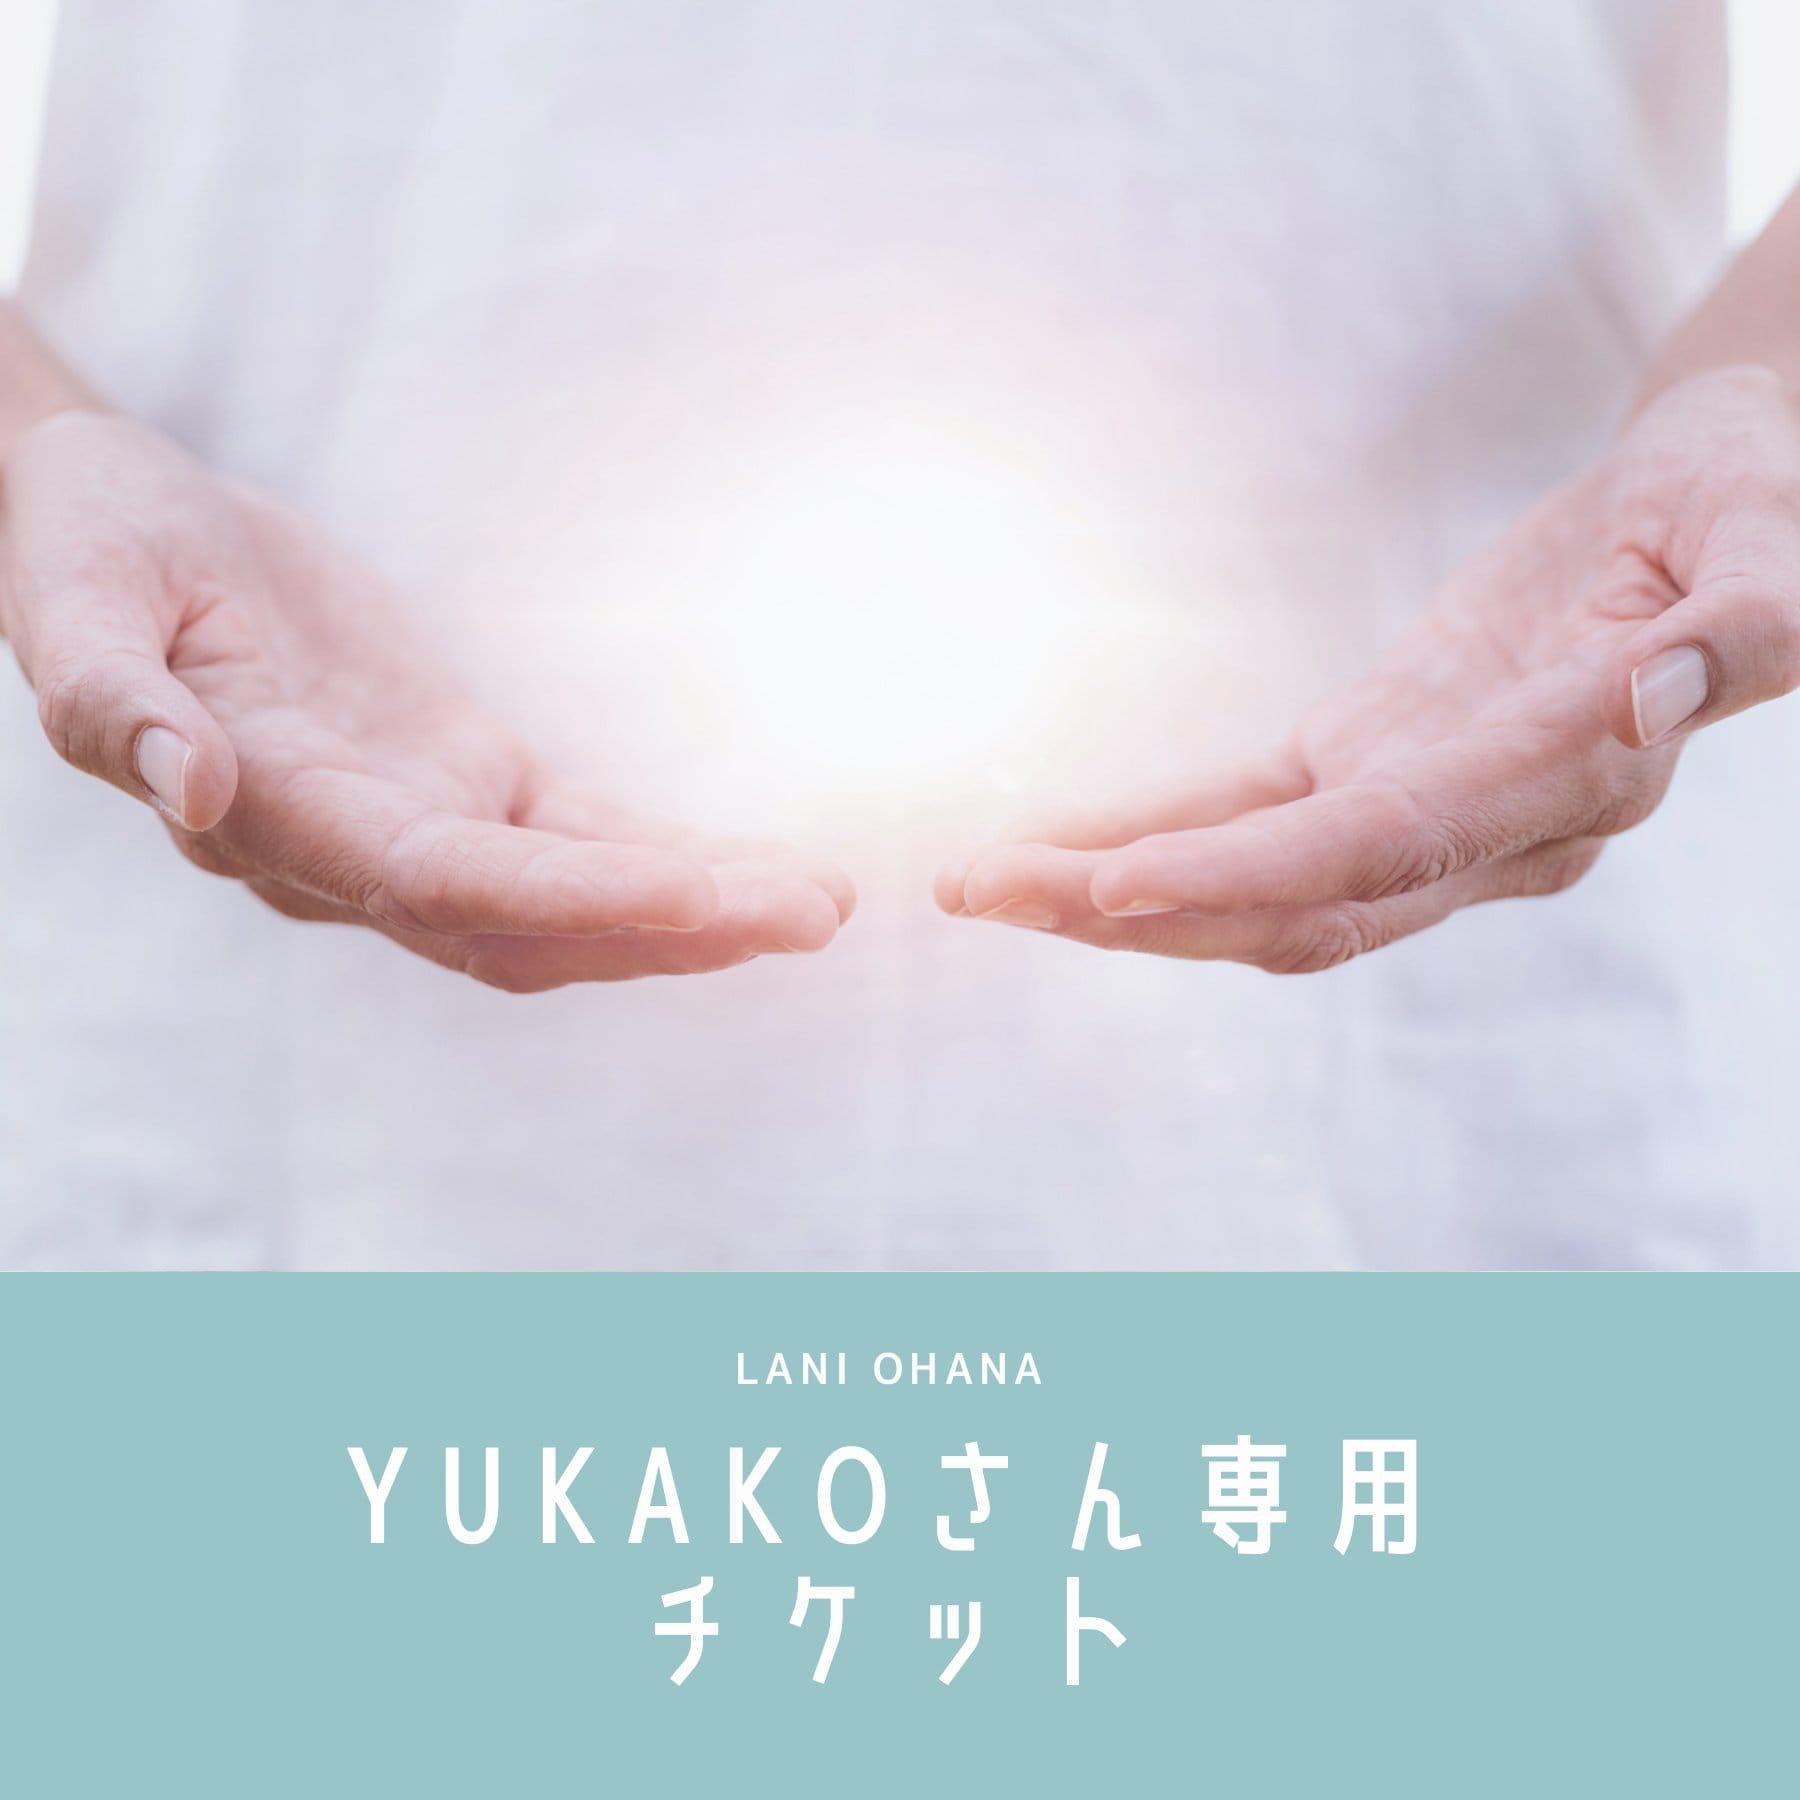 【yukakoさん専用】ファースト&セカンド&サードのイメージその1